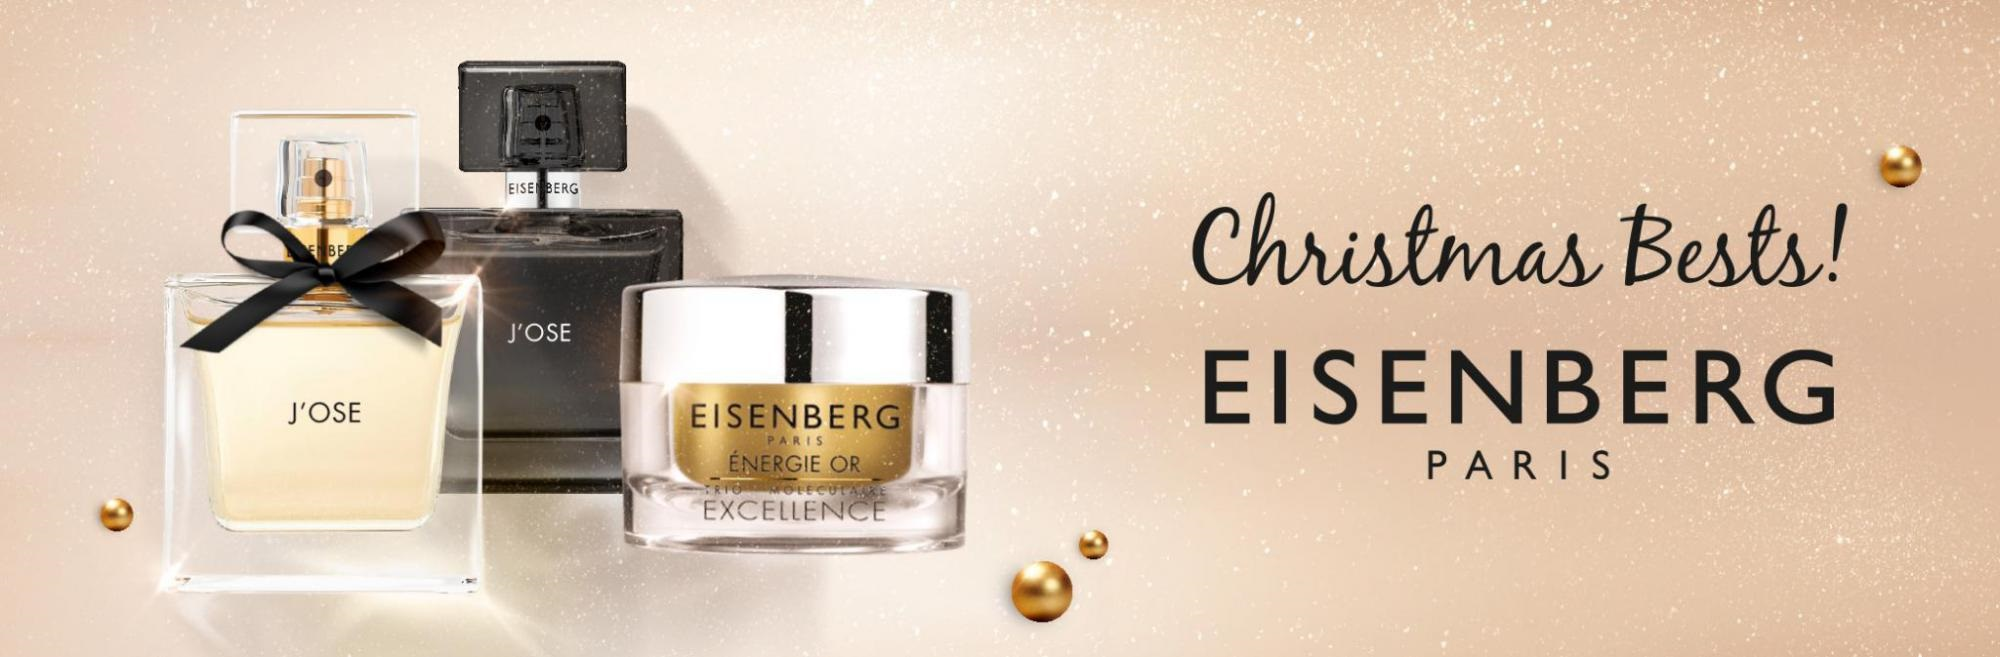 Eisenberg Christmas Bests